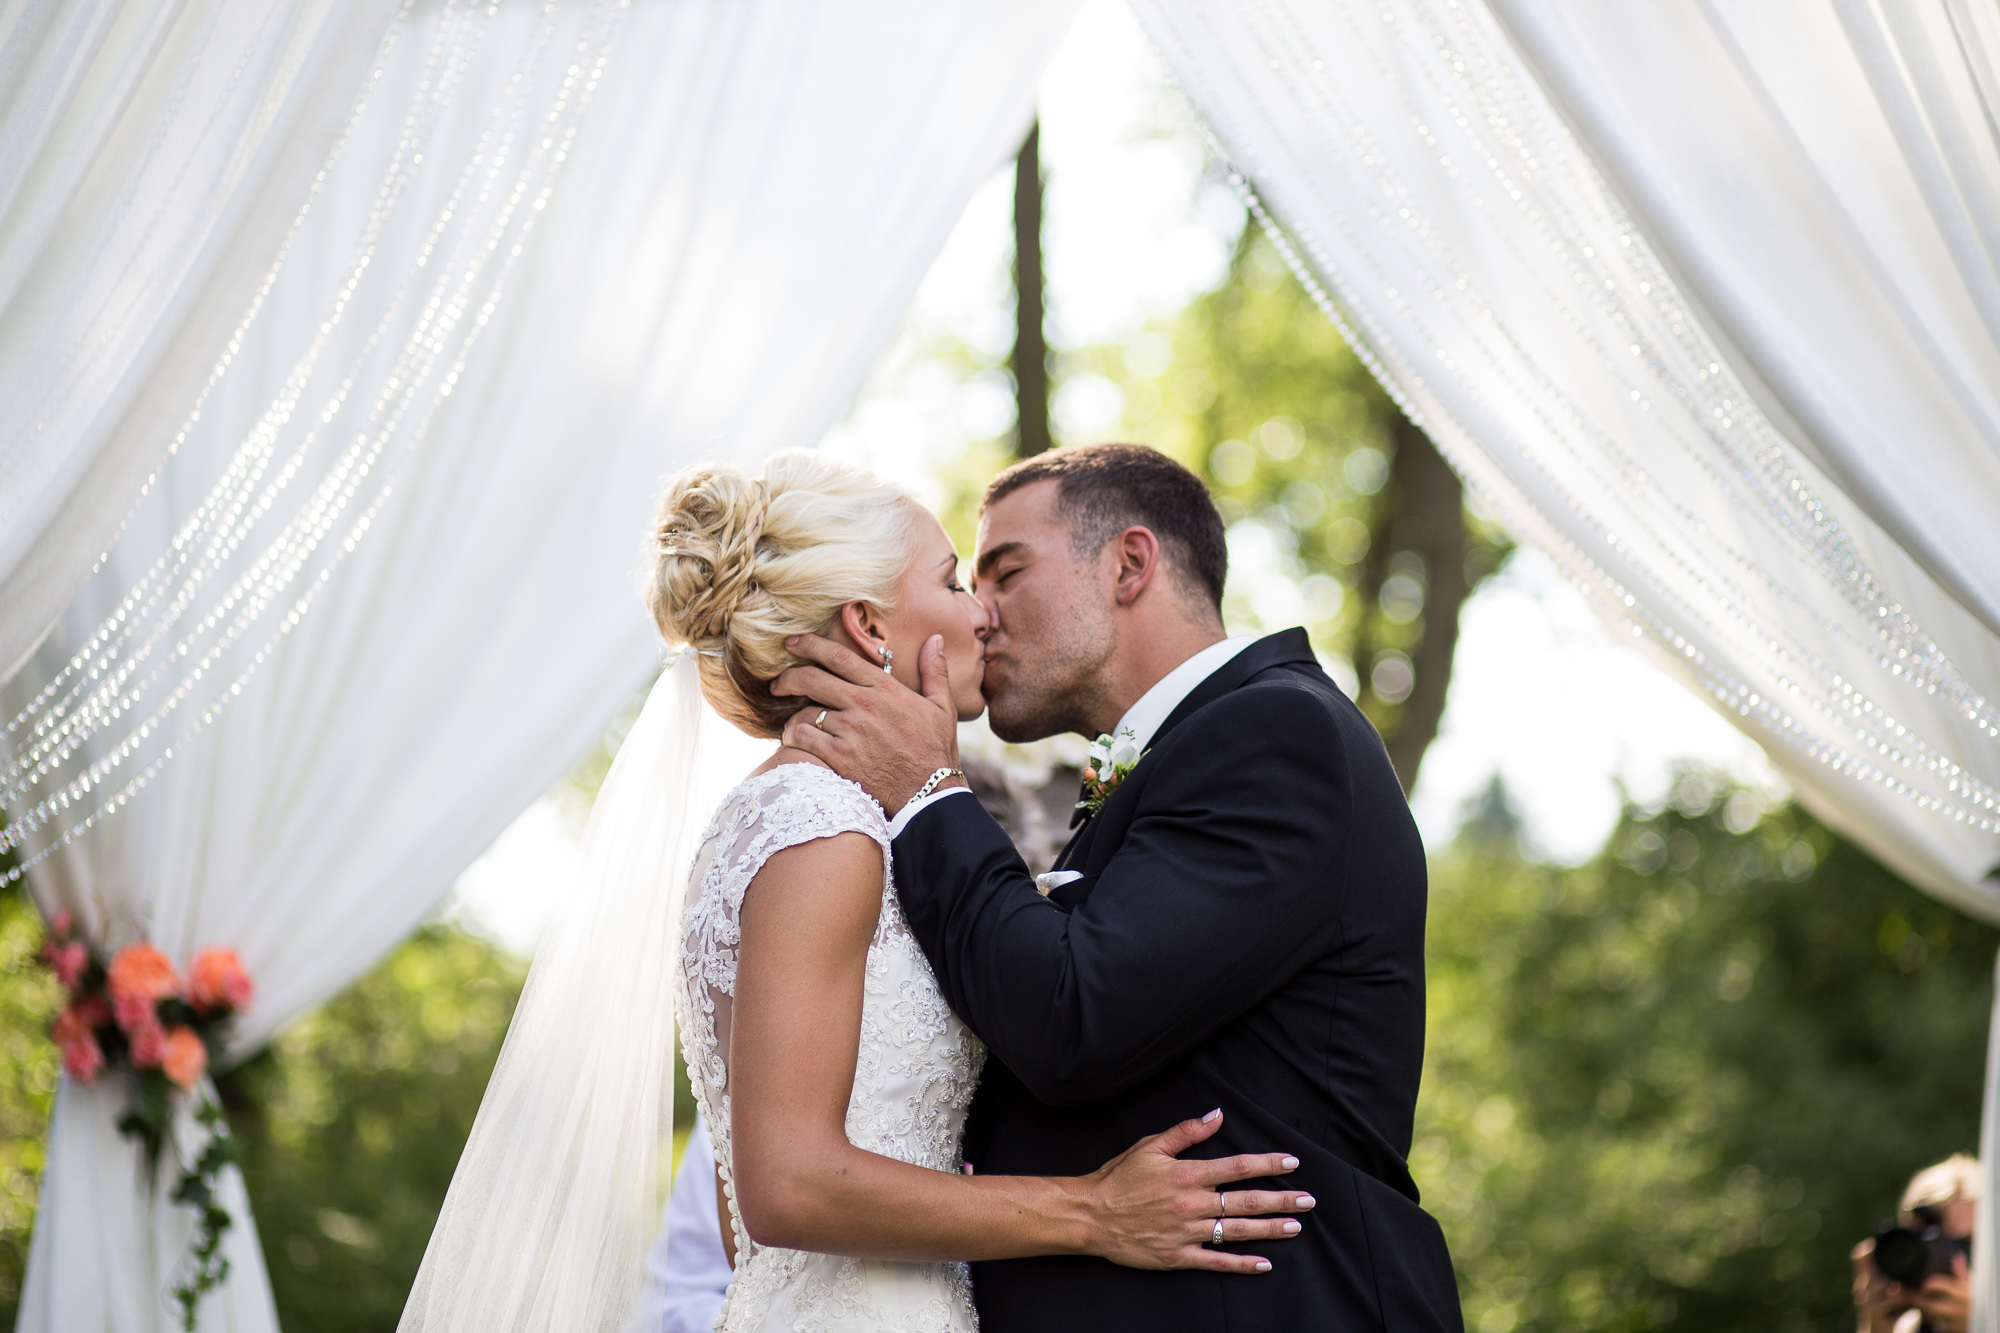 DAKOTA-DUNES-WEDDING-SOUTH-DAKOTA-WEDDING-PHOTOGRAPHER-0018.jpg